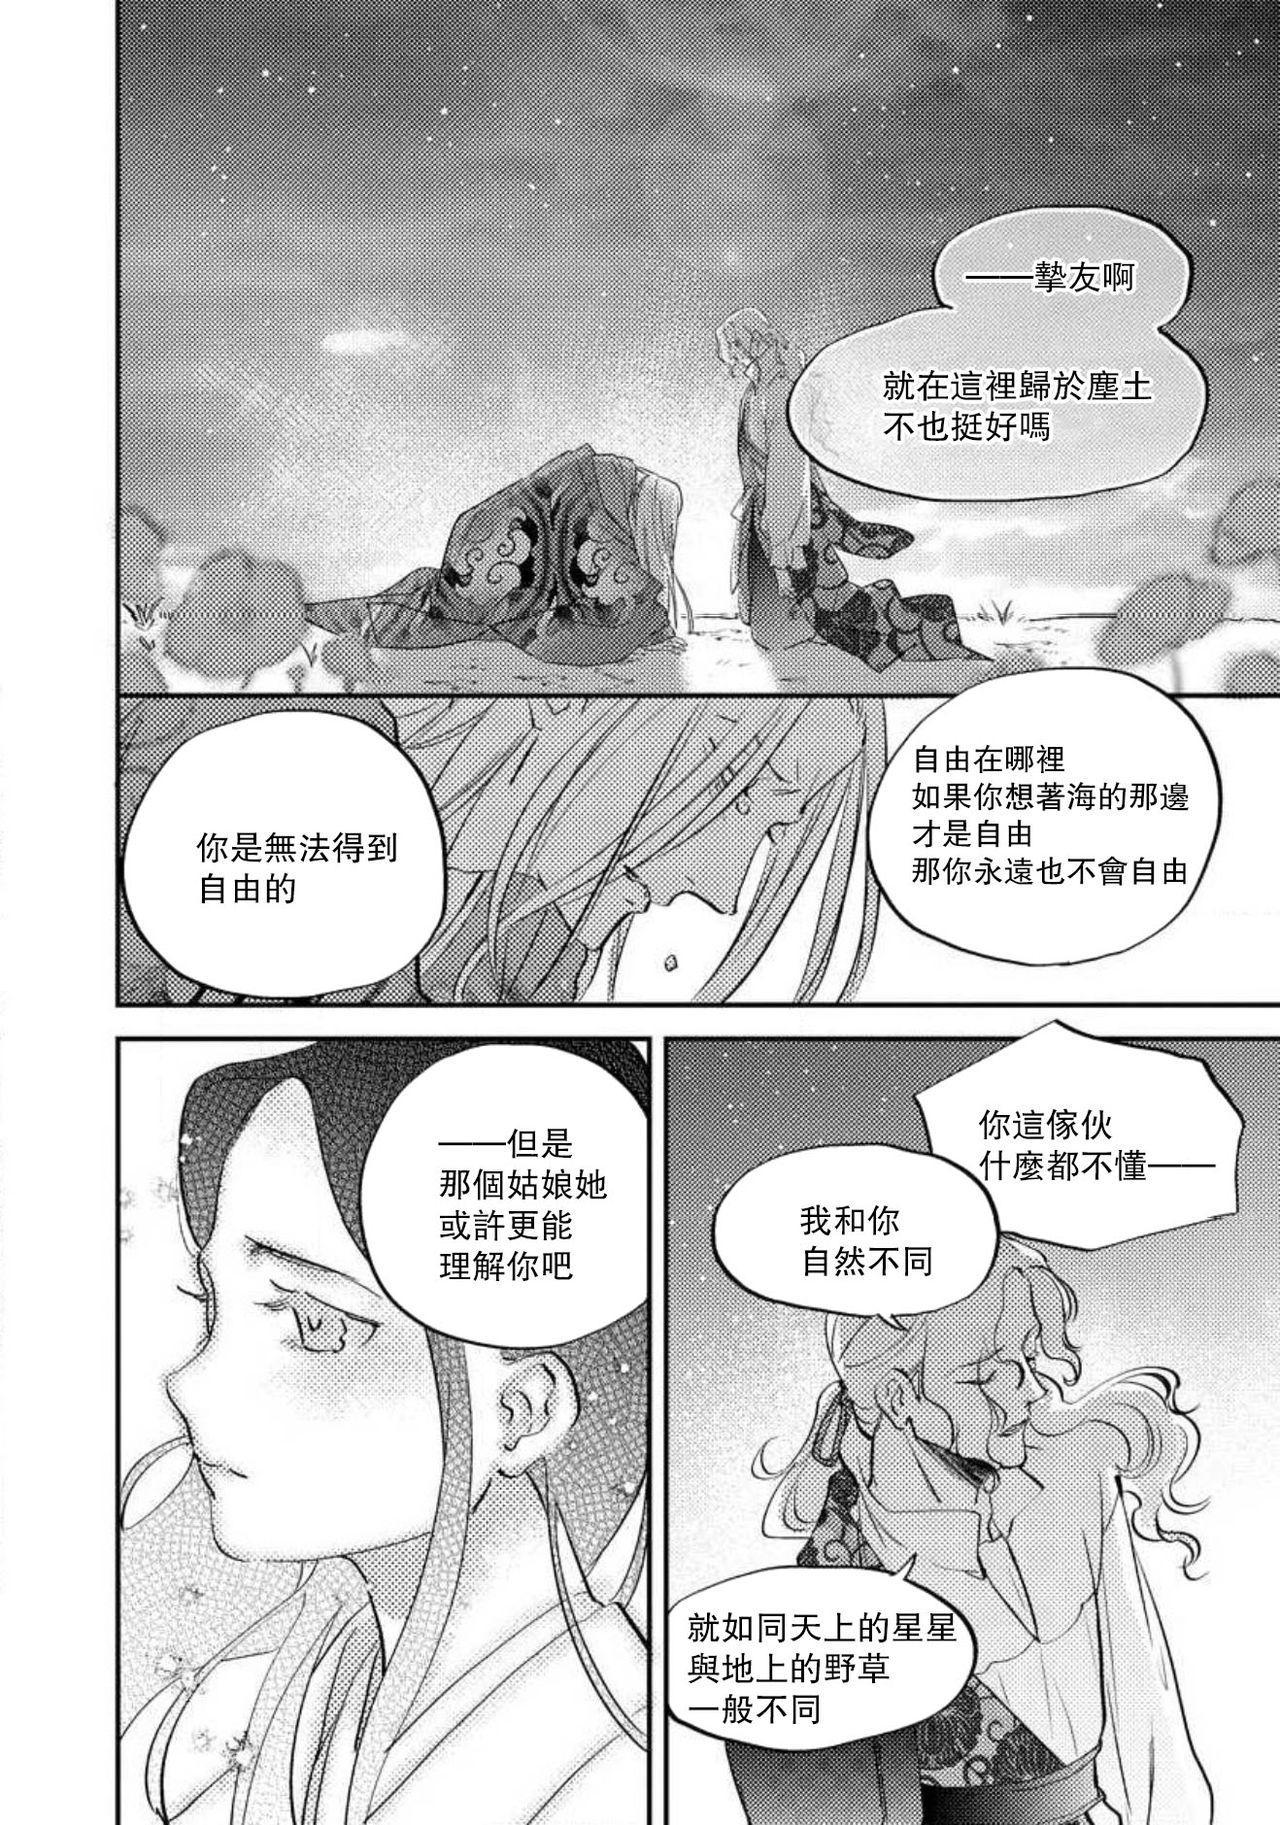 Oeyama suimutan utsukushiki oni no toraware hime | 大江山醉夢逸話 美麗的鬼與被囚禁的公主 Ch. 1-8 161